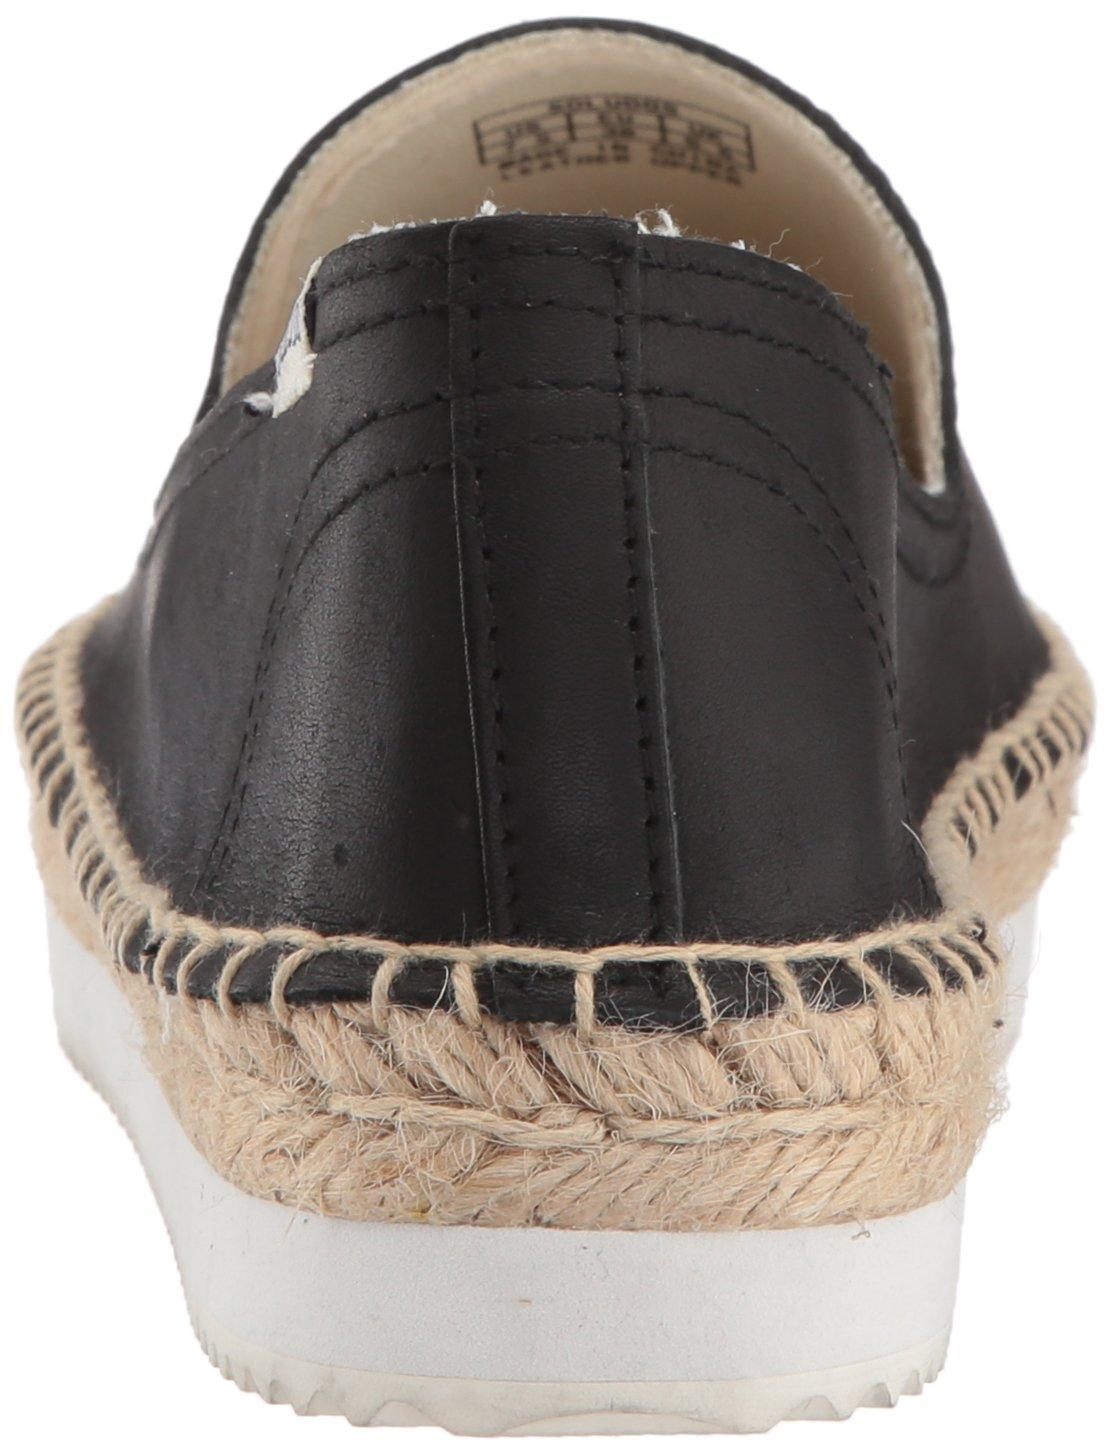 Soludos Women's MIX Sole Smkg Slipper Platform, Black, 8.5 B US by Soludos (Image #2)